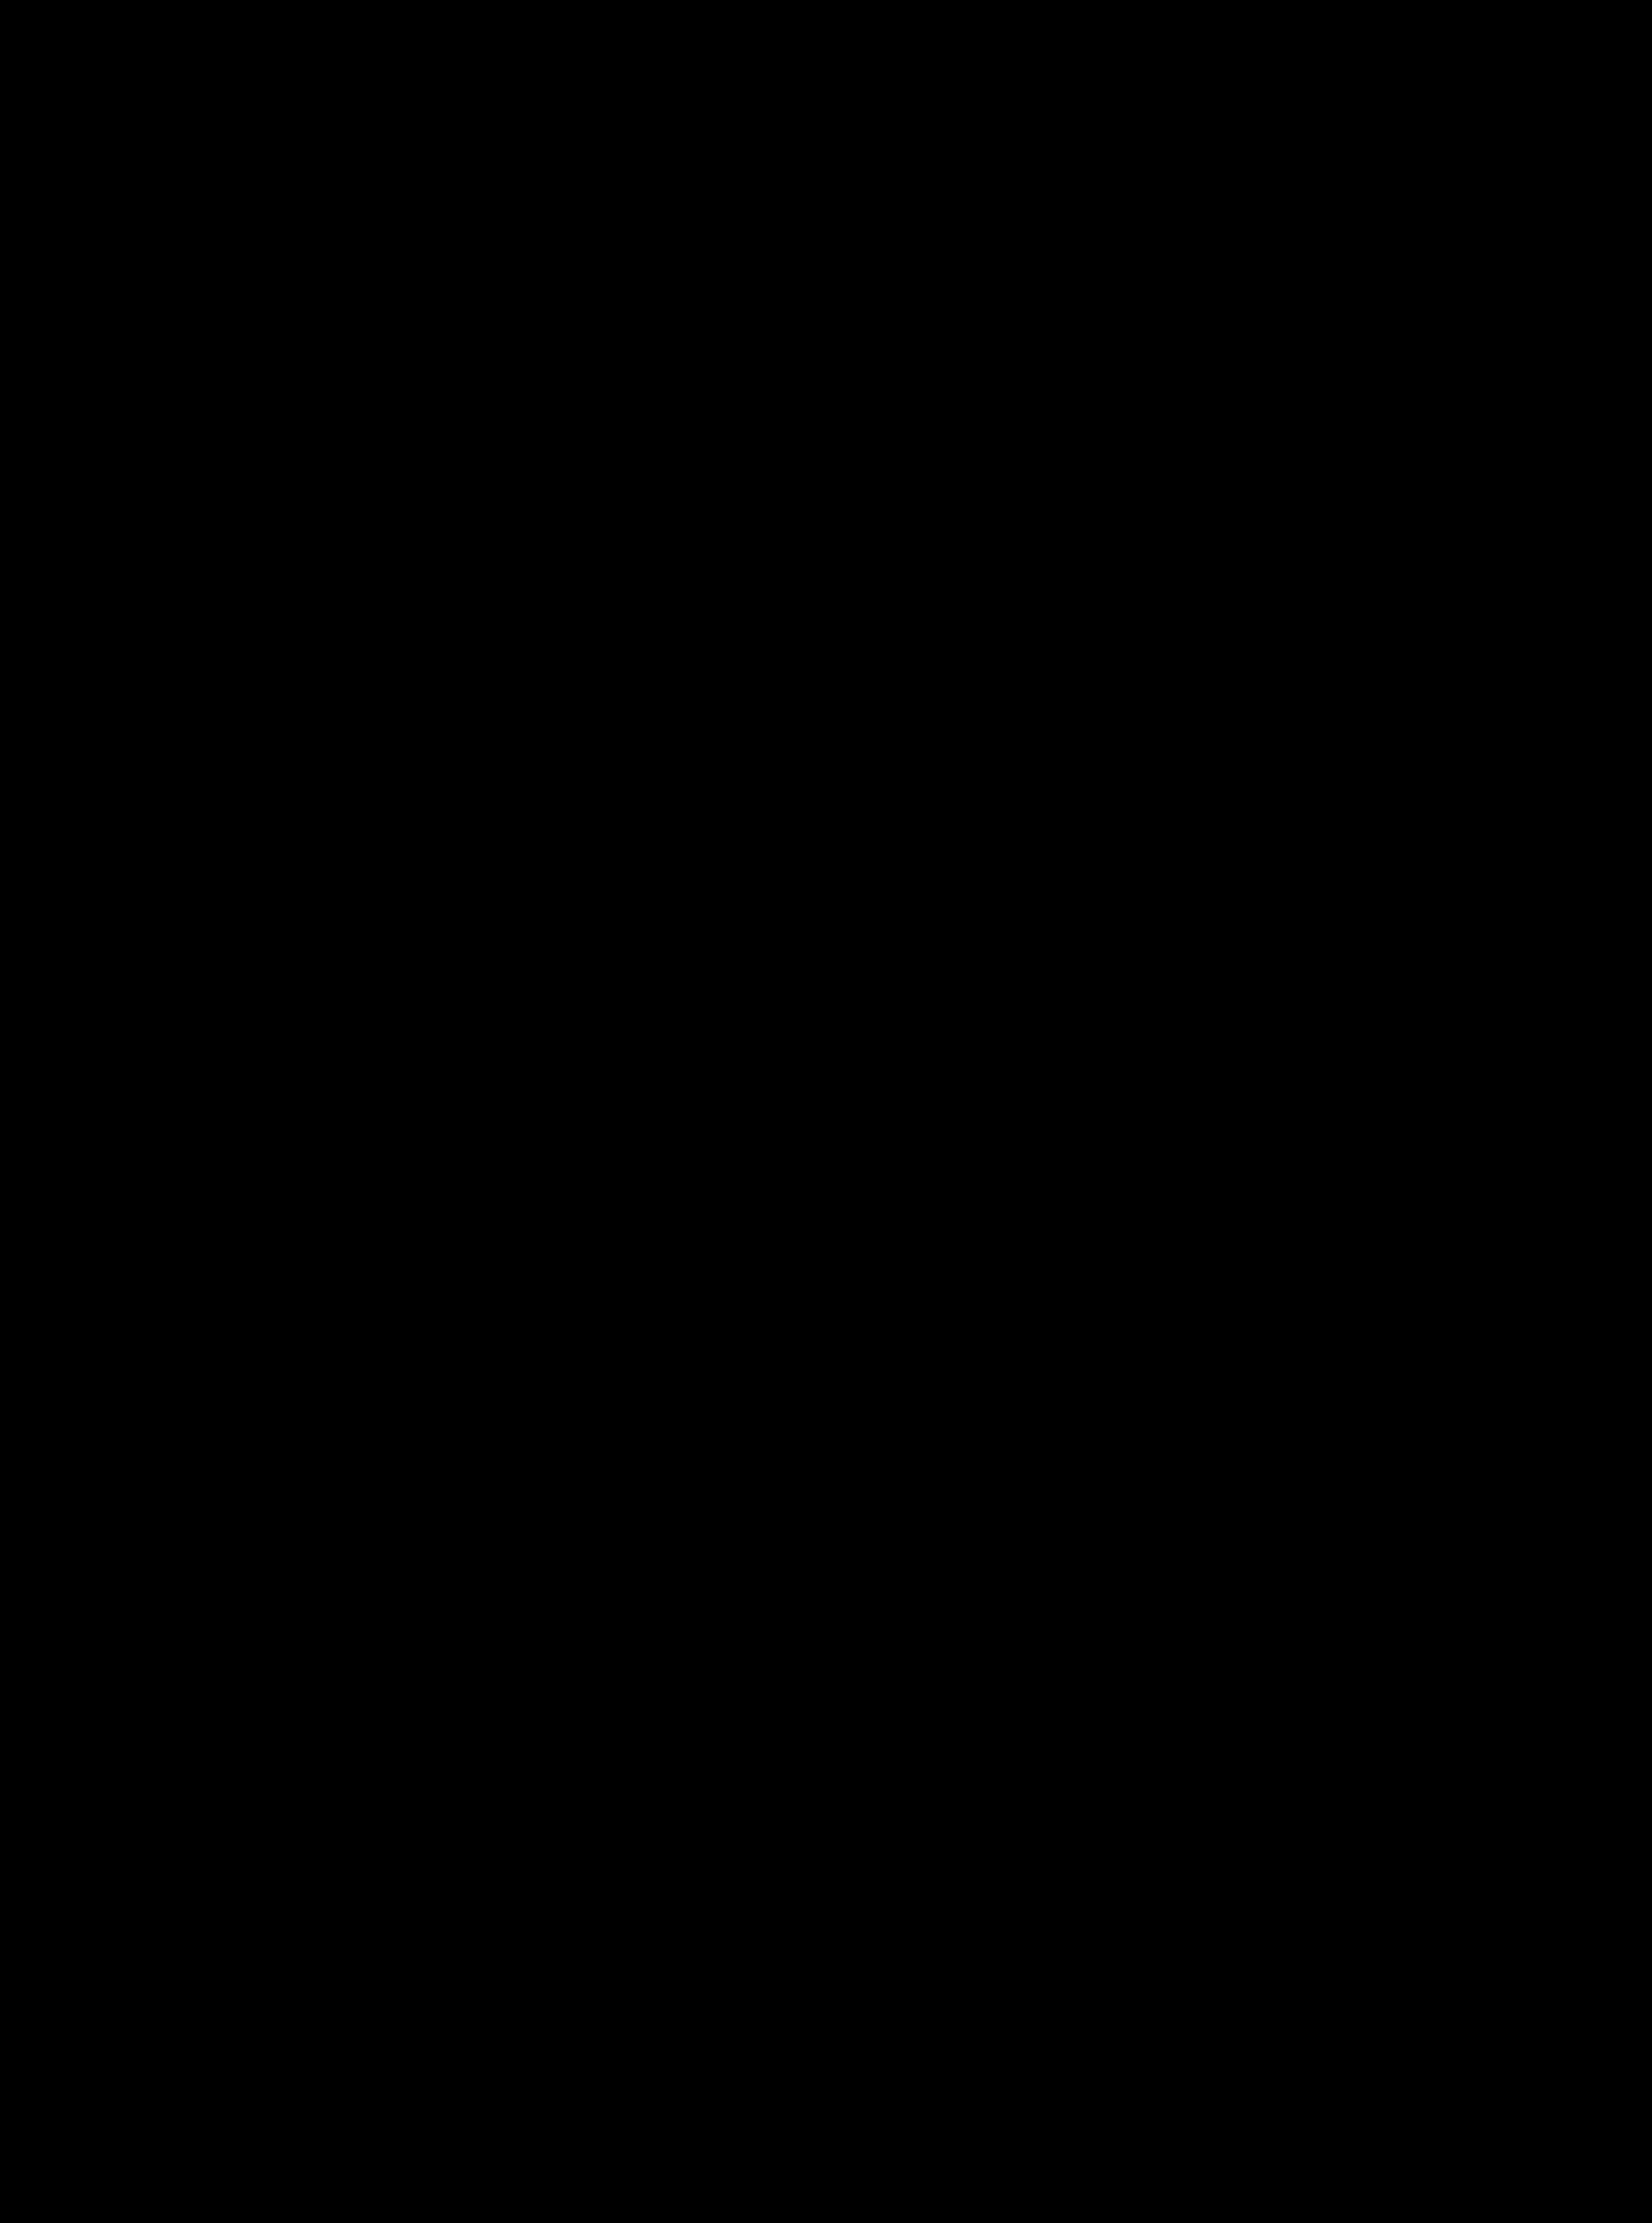 Torrecchia 2 600mm x 500mm